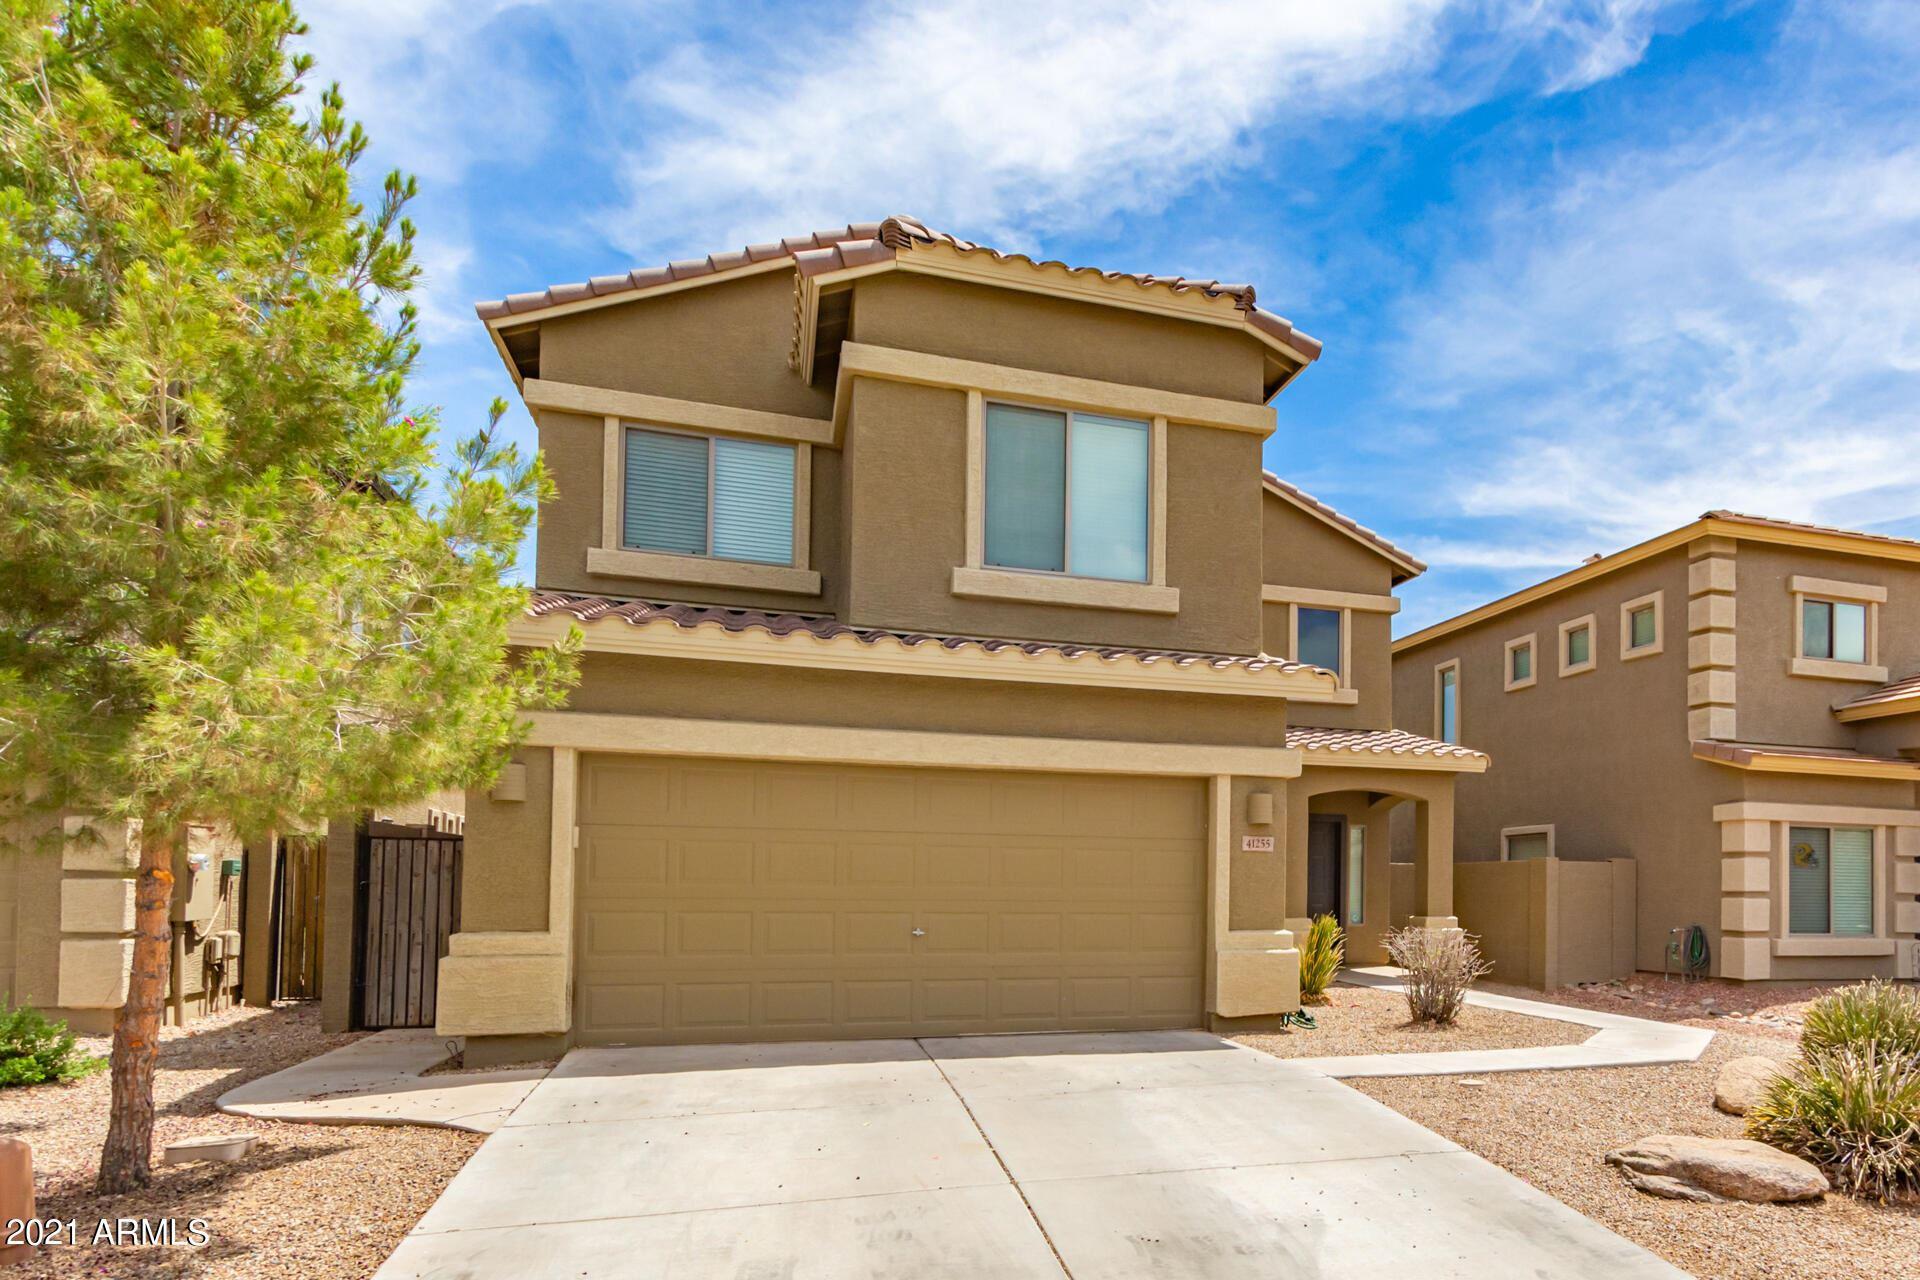 Photo of 41255 W GRANADA Drive, Maricopa, AZ 85138 (MLS # 6248516)